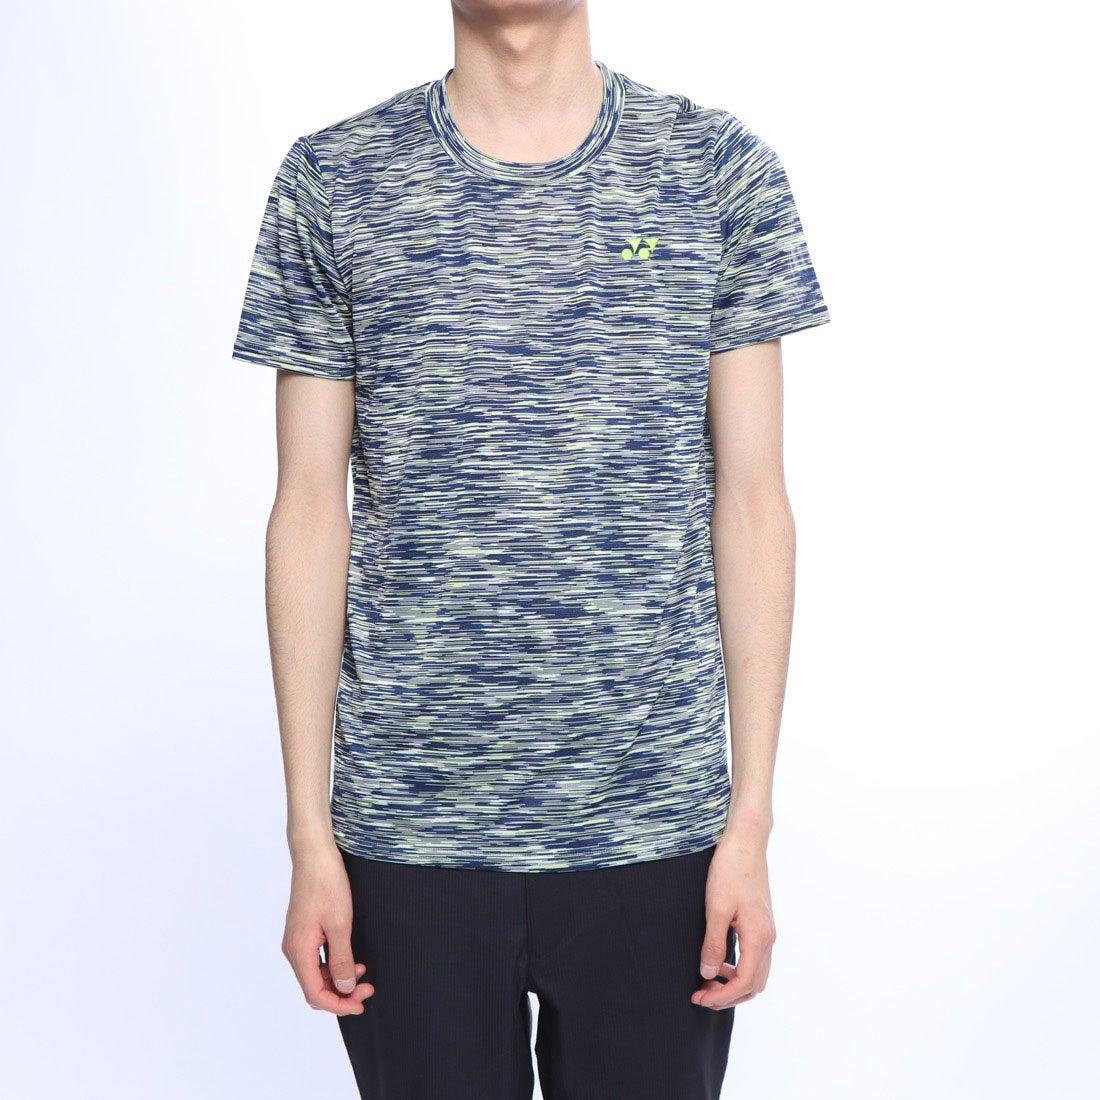 5cc9f049afd9d ヨネックス YONEX テニス 半袖Tシャツ ドライTシャツ(フィットスタイル) 16403 -レディースファッション通販 ロコンドガールズコレクション  (LOCONDO GIRL'S ...